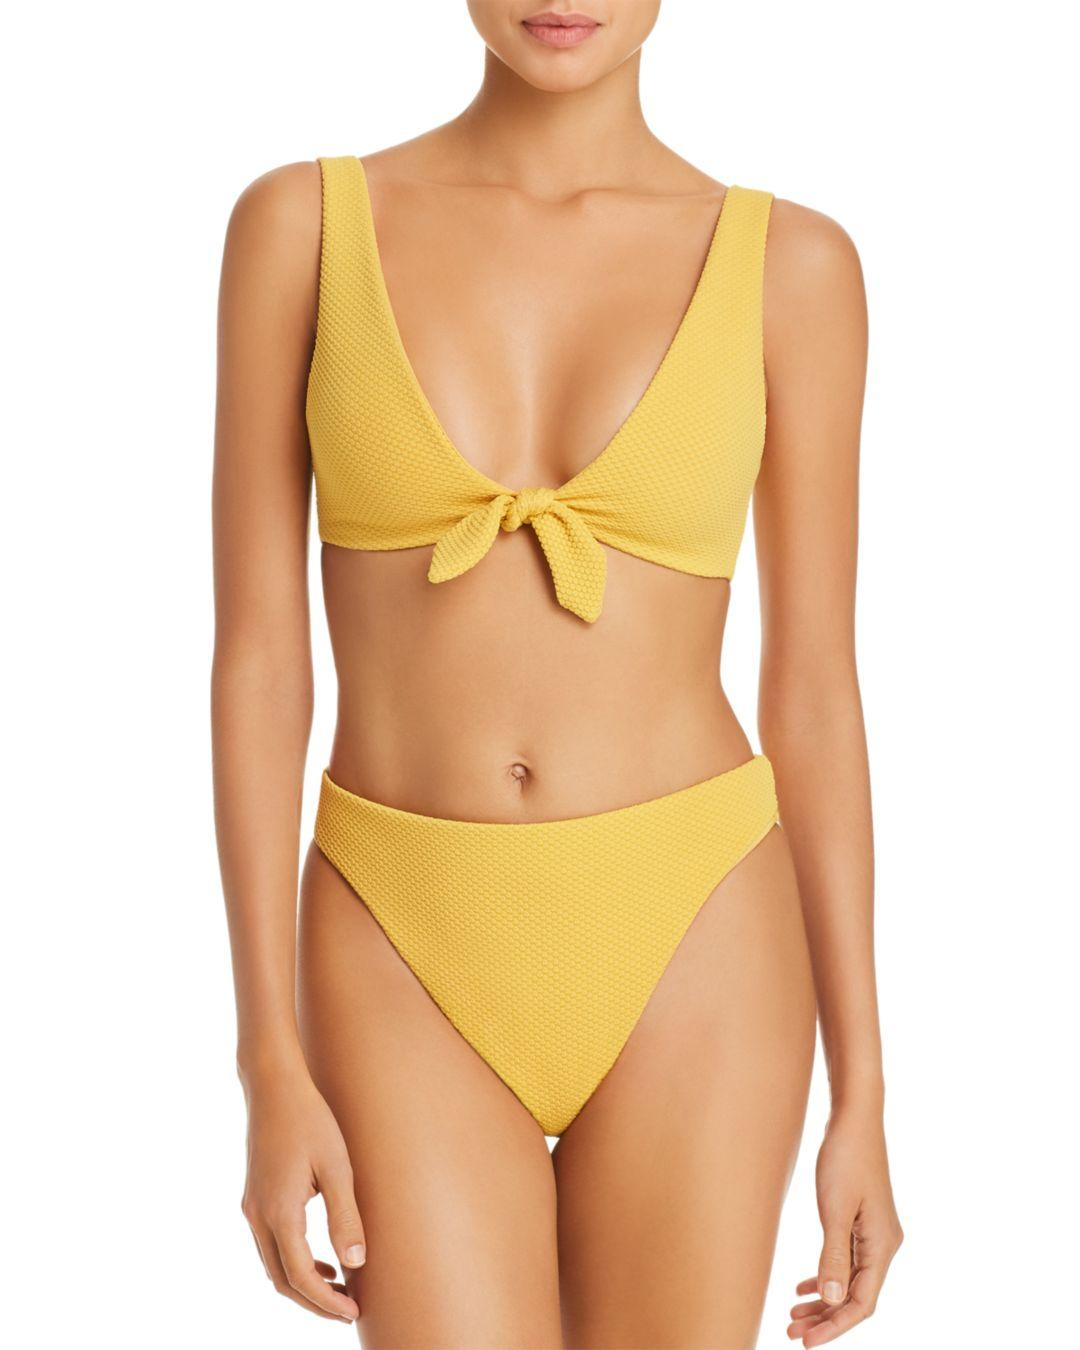 33deb156100a9 MINKPINK Alexa Tie - Front Bikini Top in Yellow - Lyst